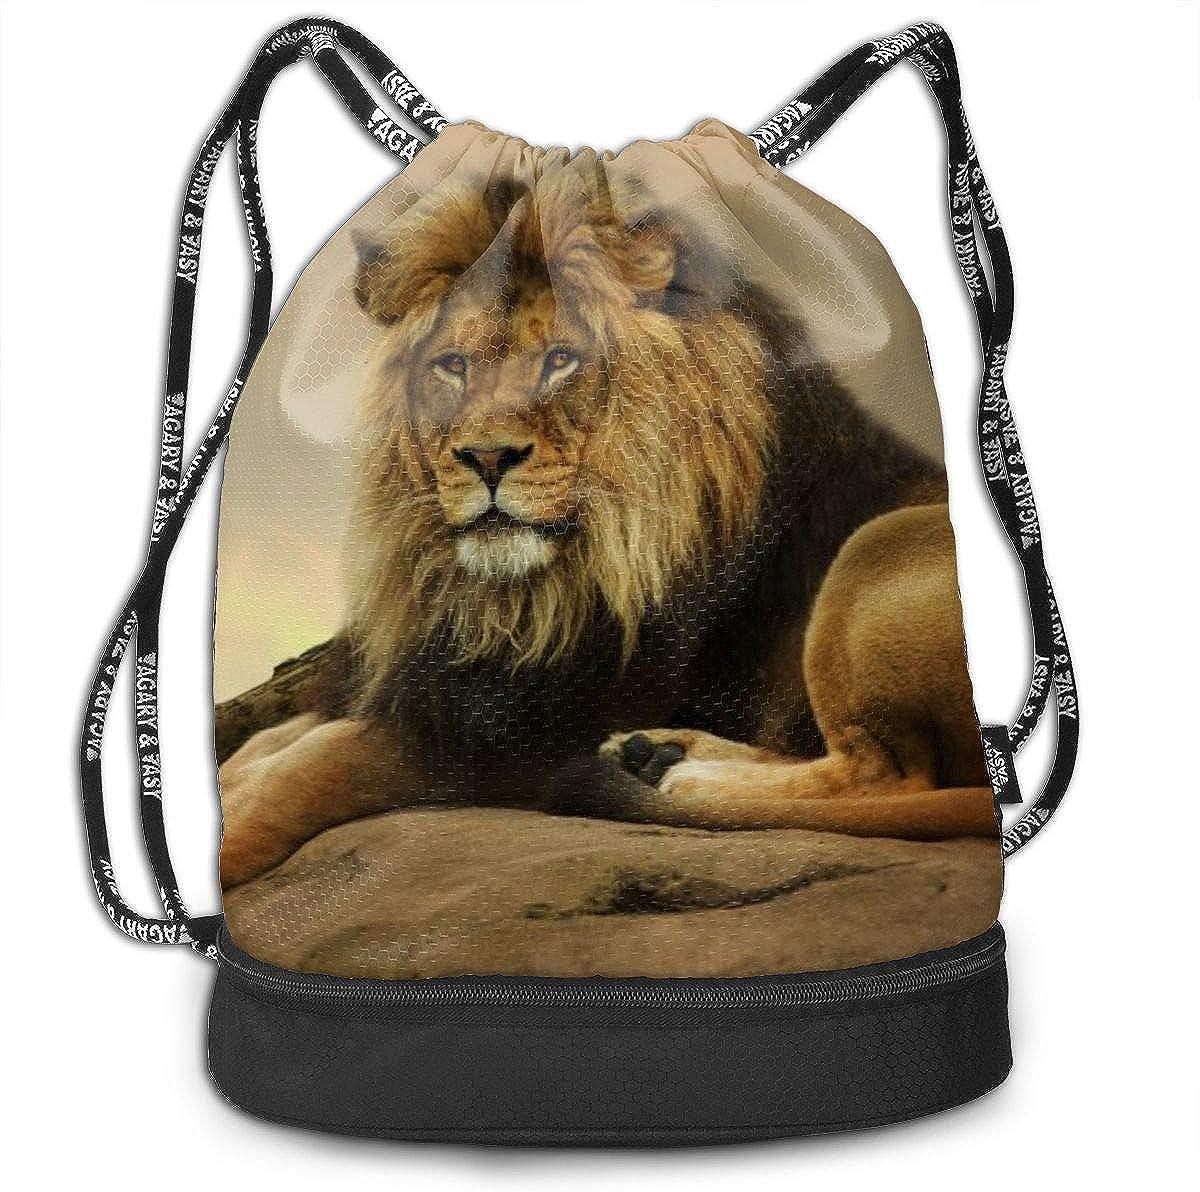 Gym Yoga Runner Sports Daypack Portable Bundle Backpack Amazing Space Funny Logo Drawstring Bag For Girls /& Boys